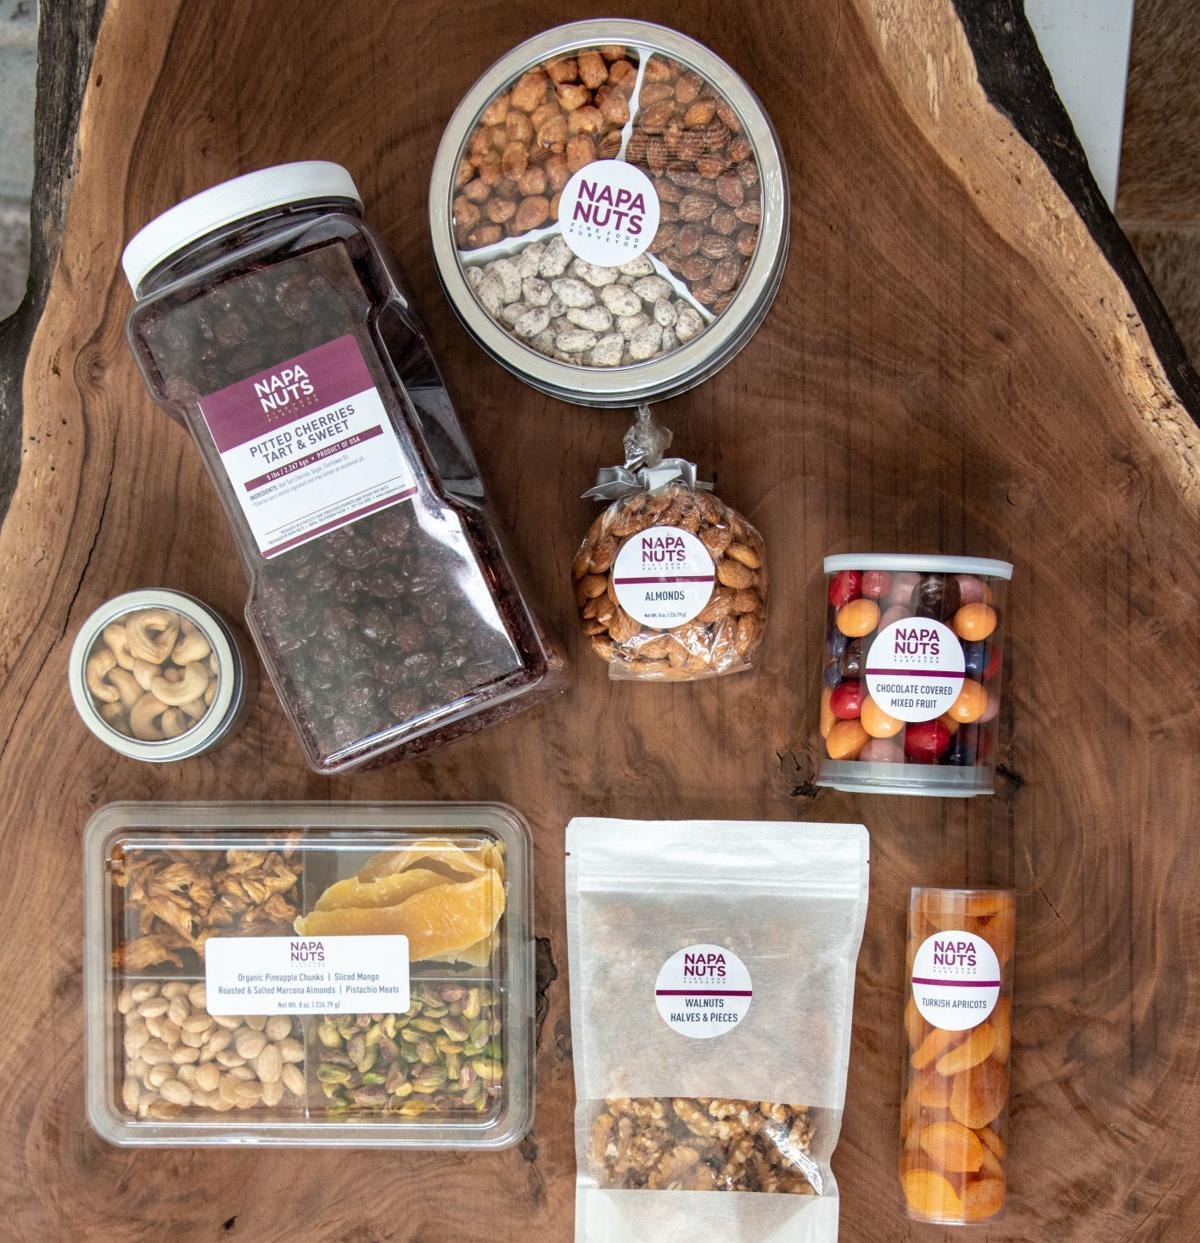 A selection from Napa Nuts, a company based in Napa.